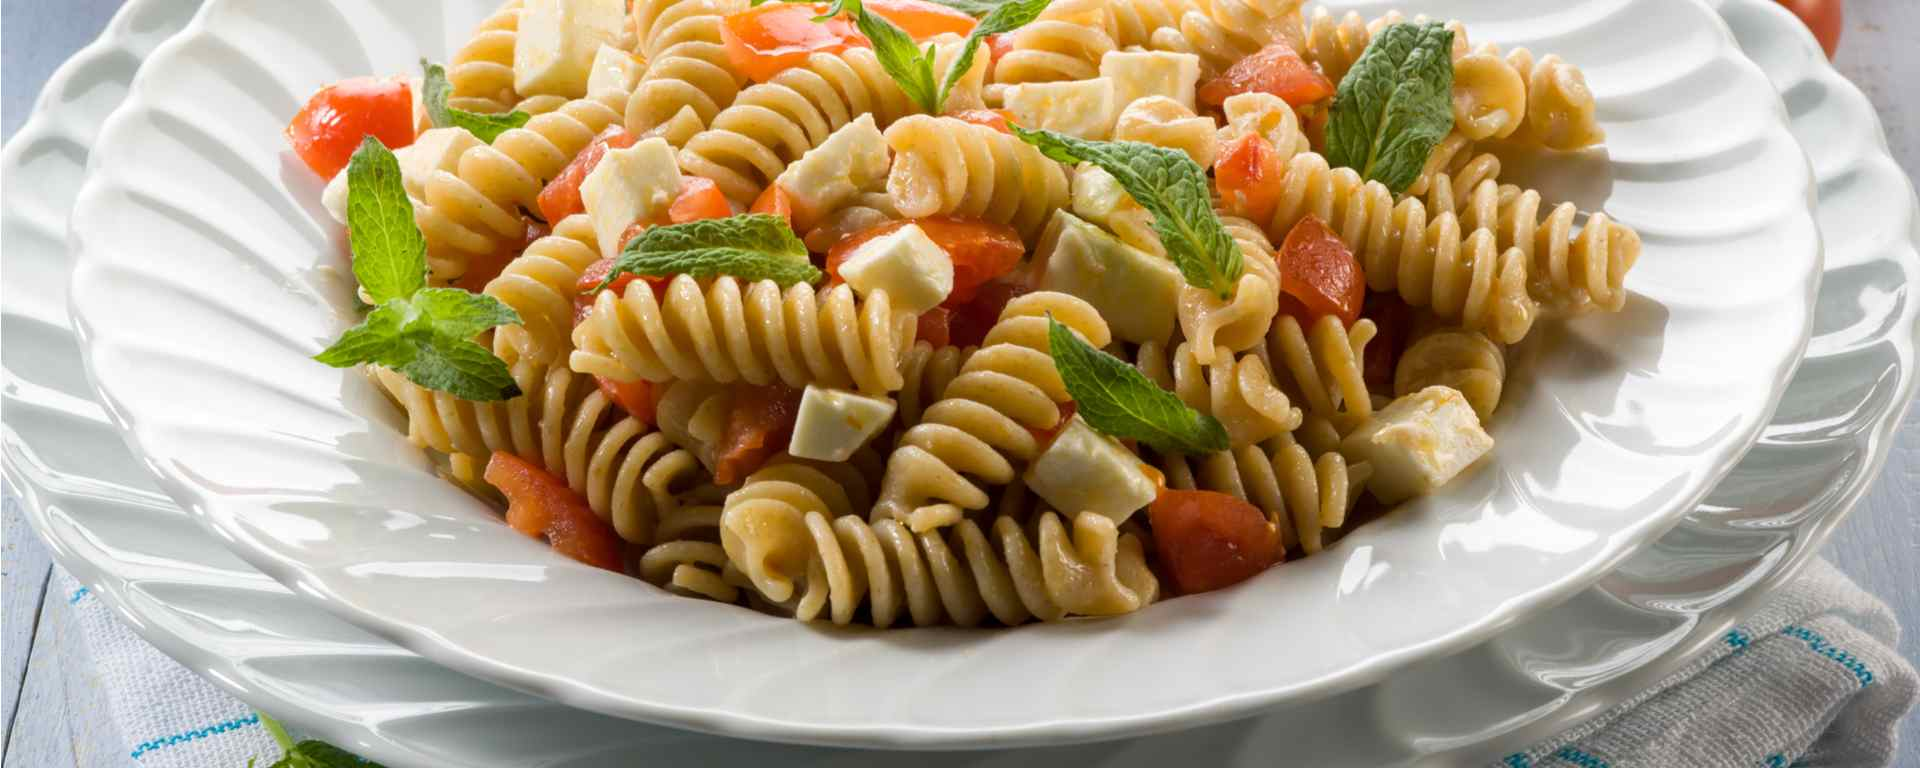 Photo for - Raspberry Pesto Pasta Salad